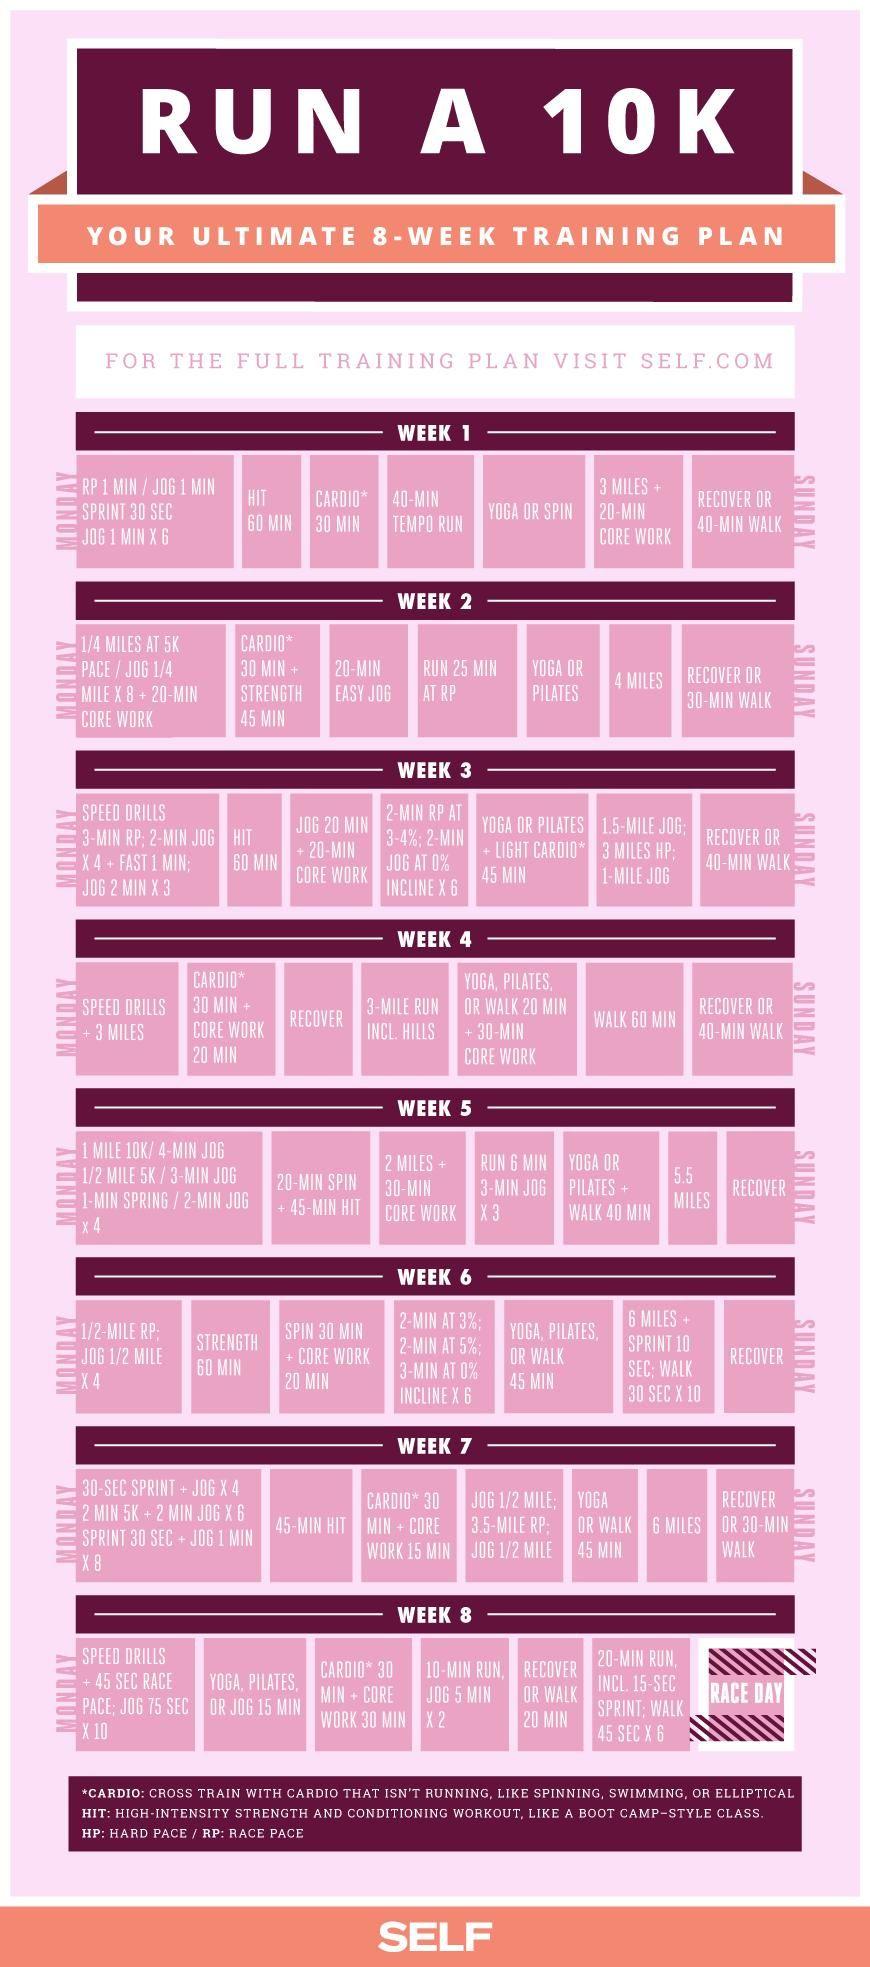 run a 10k the ultimate 8 week training plan sport. Black Bedroom Furniture Sets. Home Design Ideas